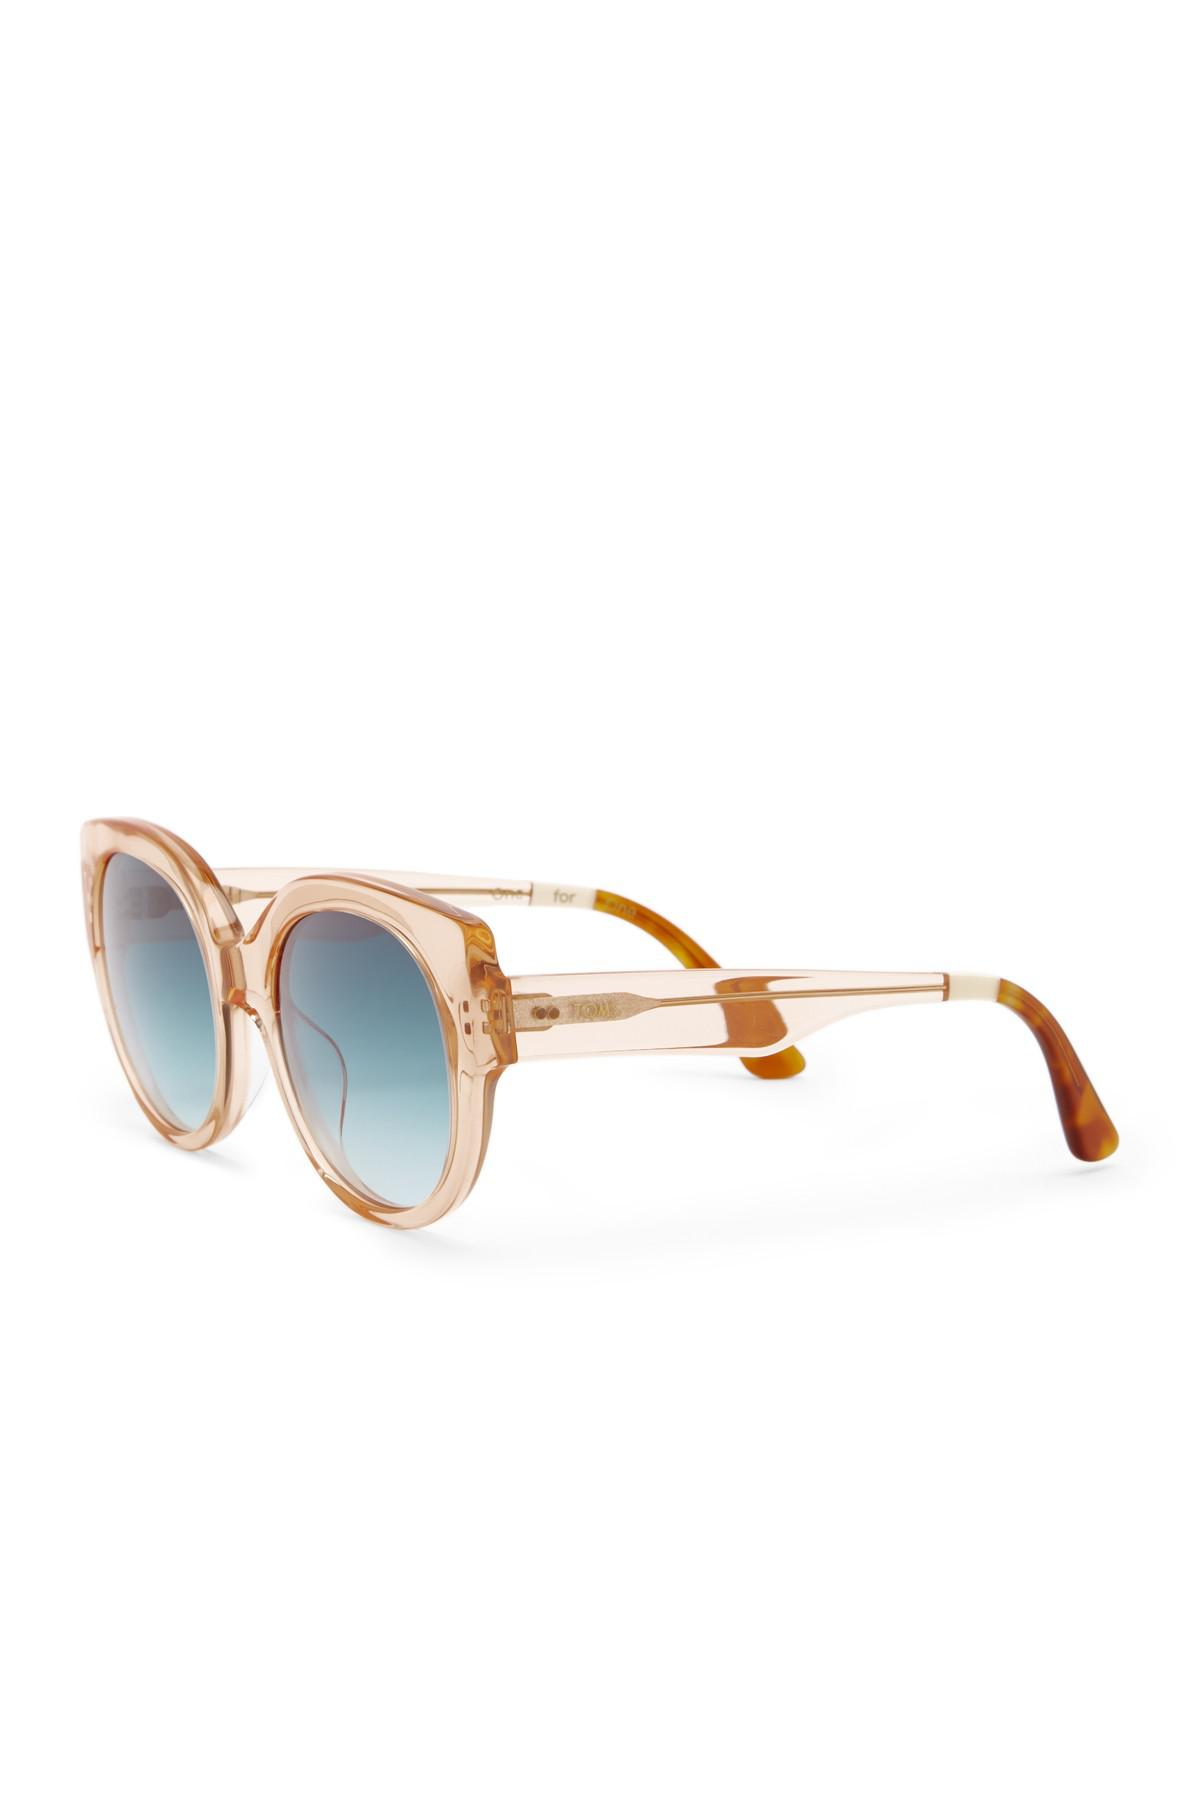 c8fa85a381bec Lyst - TOMS Luisa 54mm Cat Eye Sunglasses in Blue